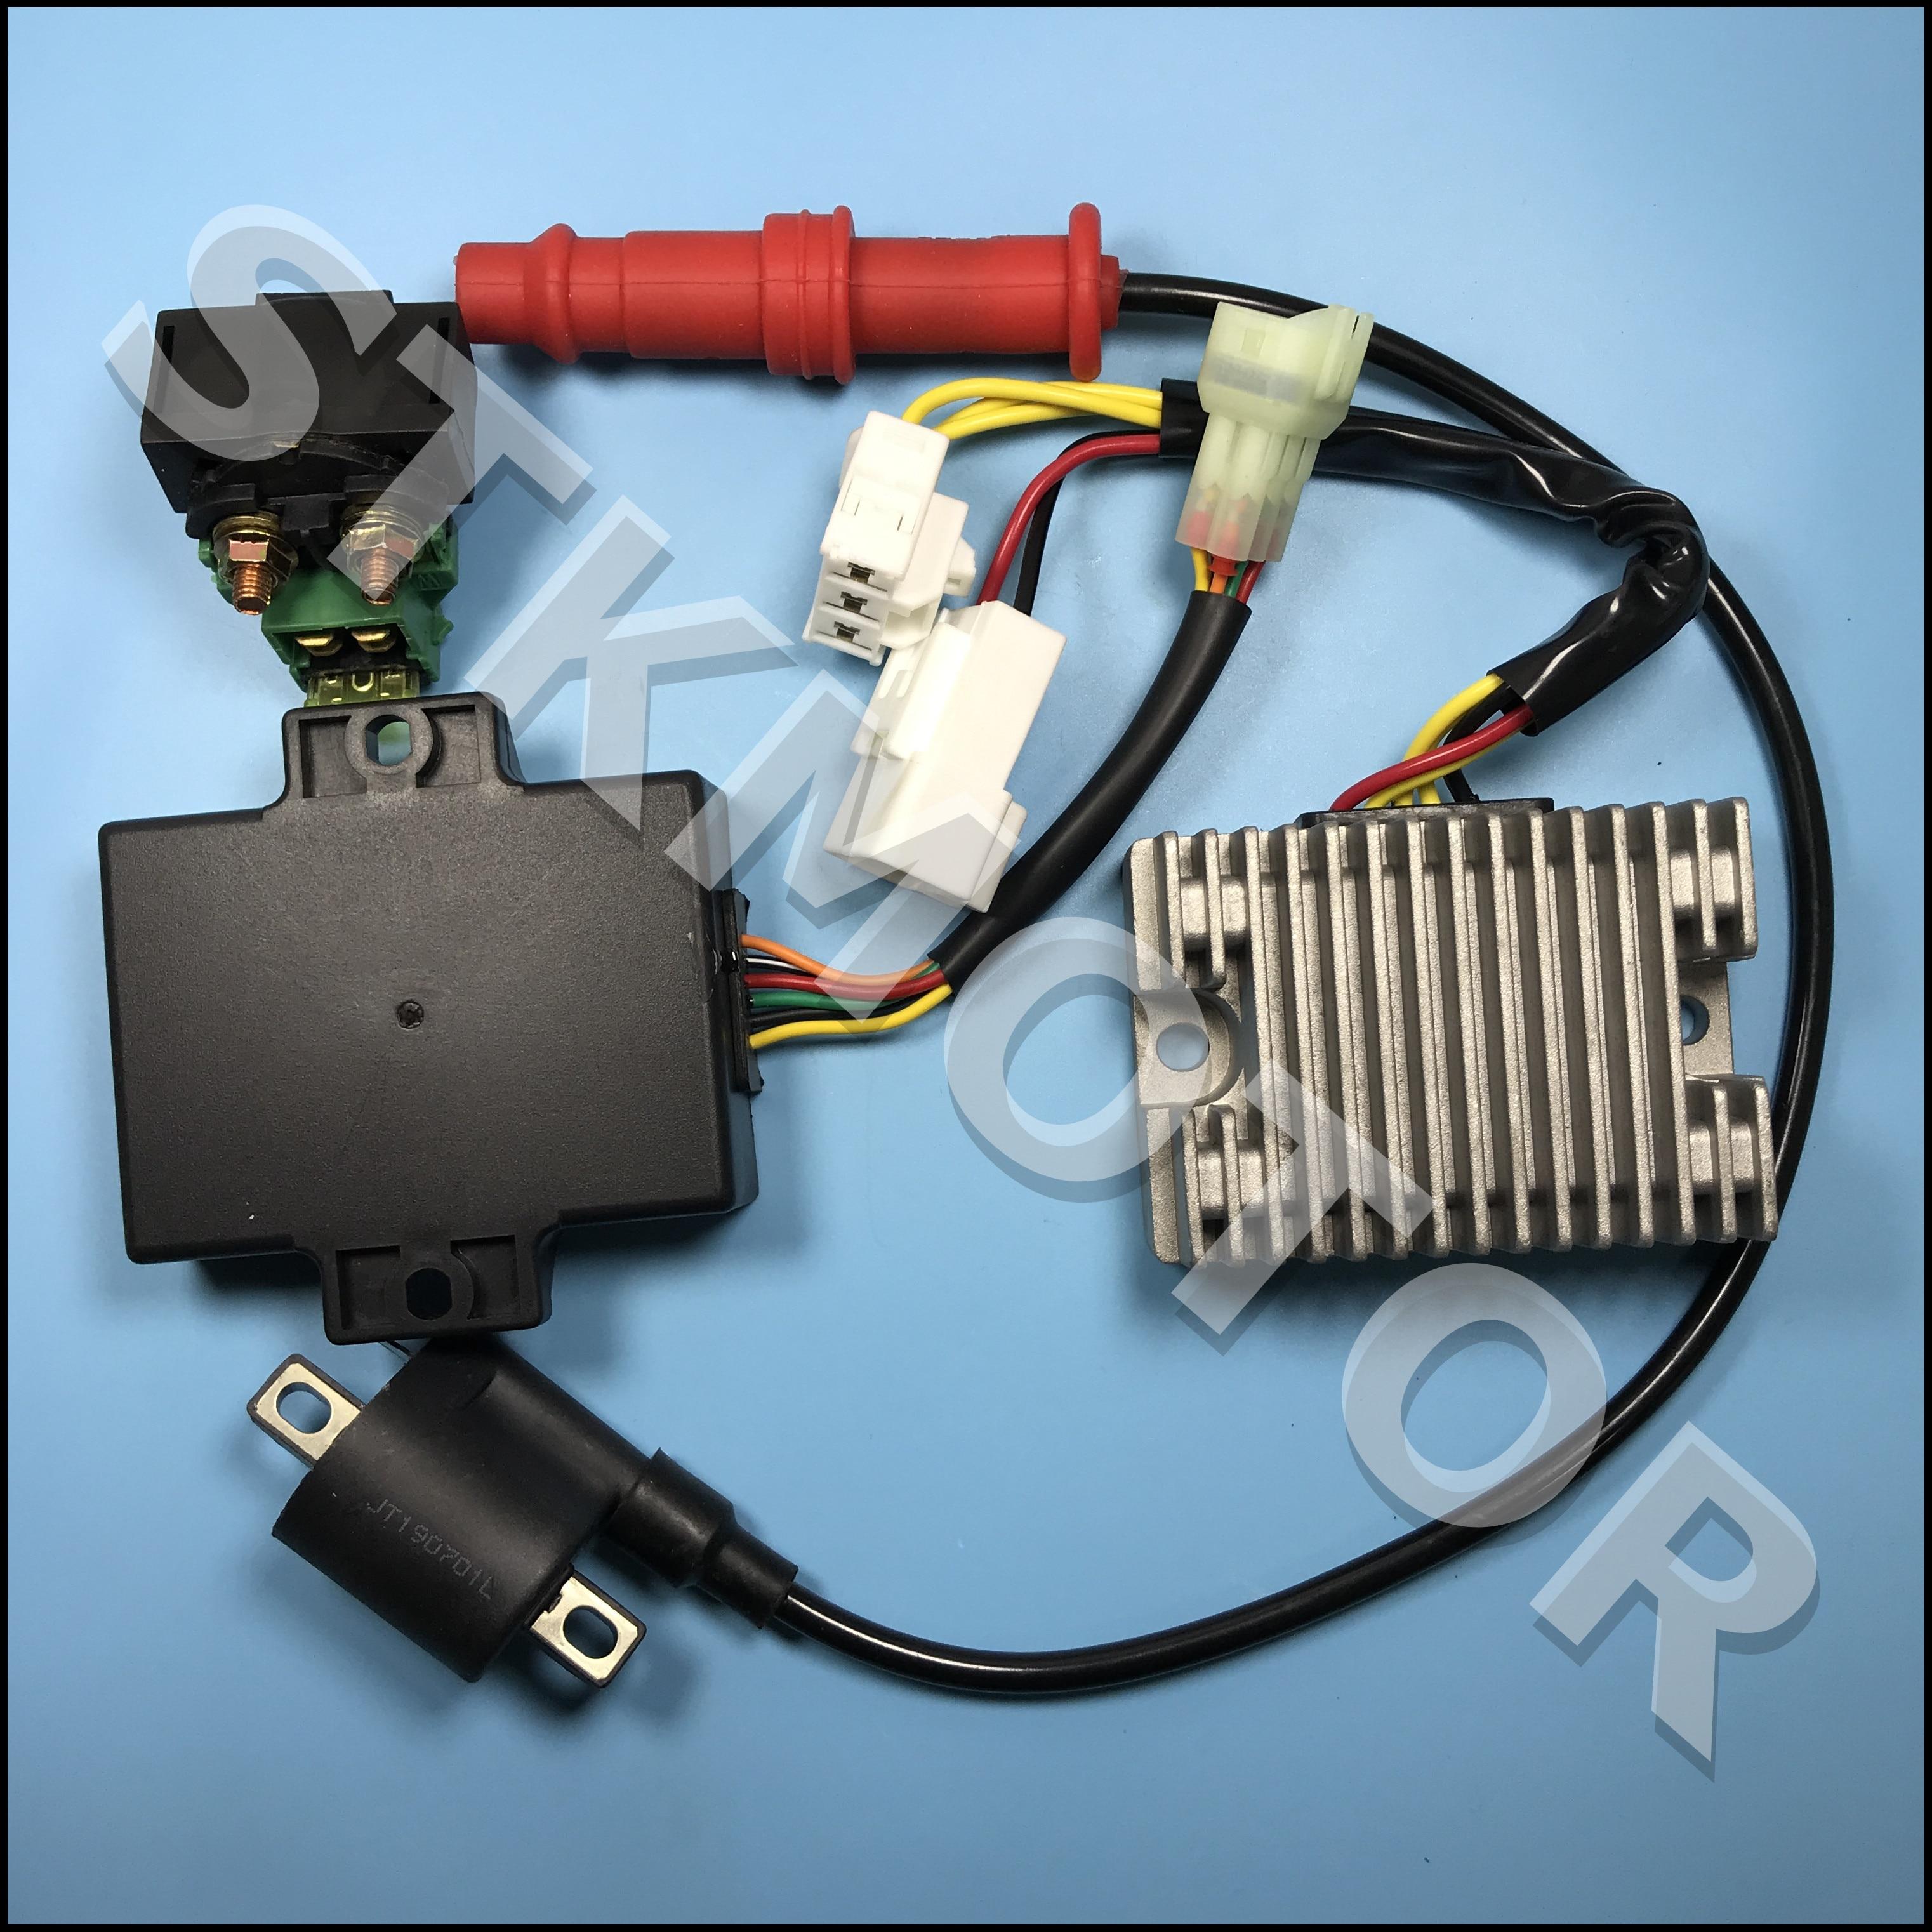 KAZUMA 500 500CC ATV Quad электрические части CDI катушка зажигания реле регулятор напряжения